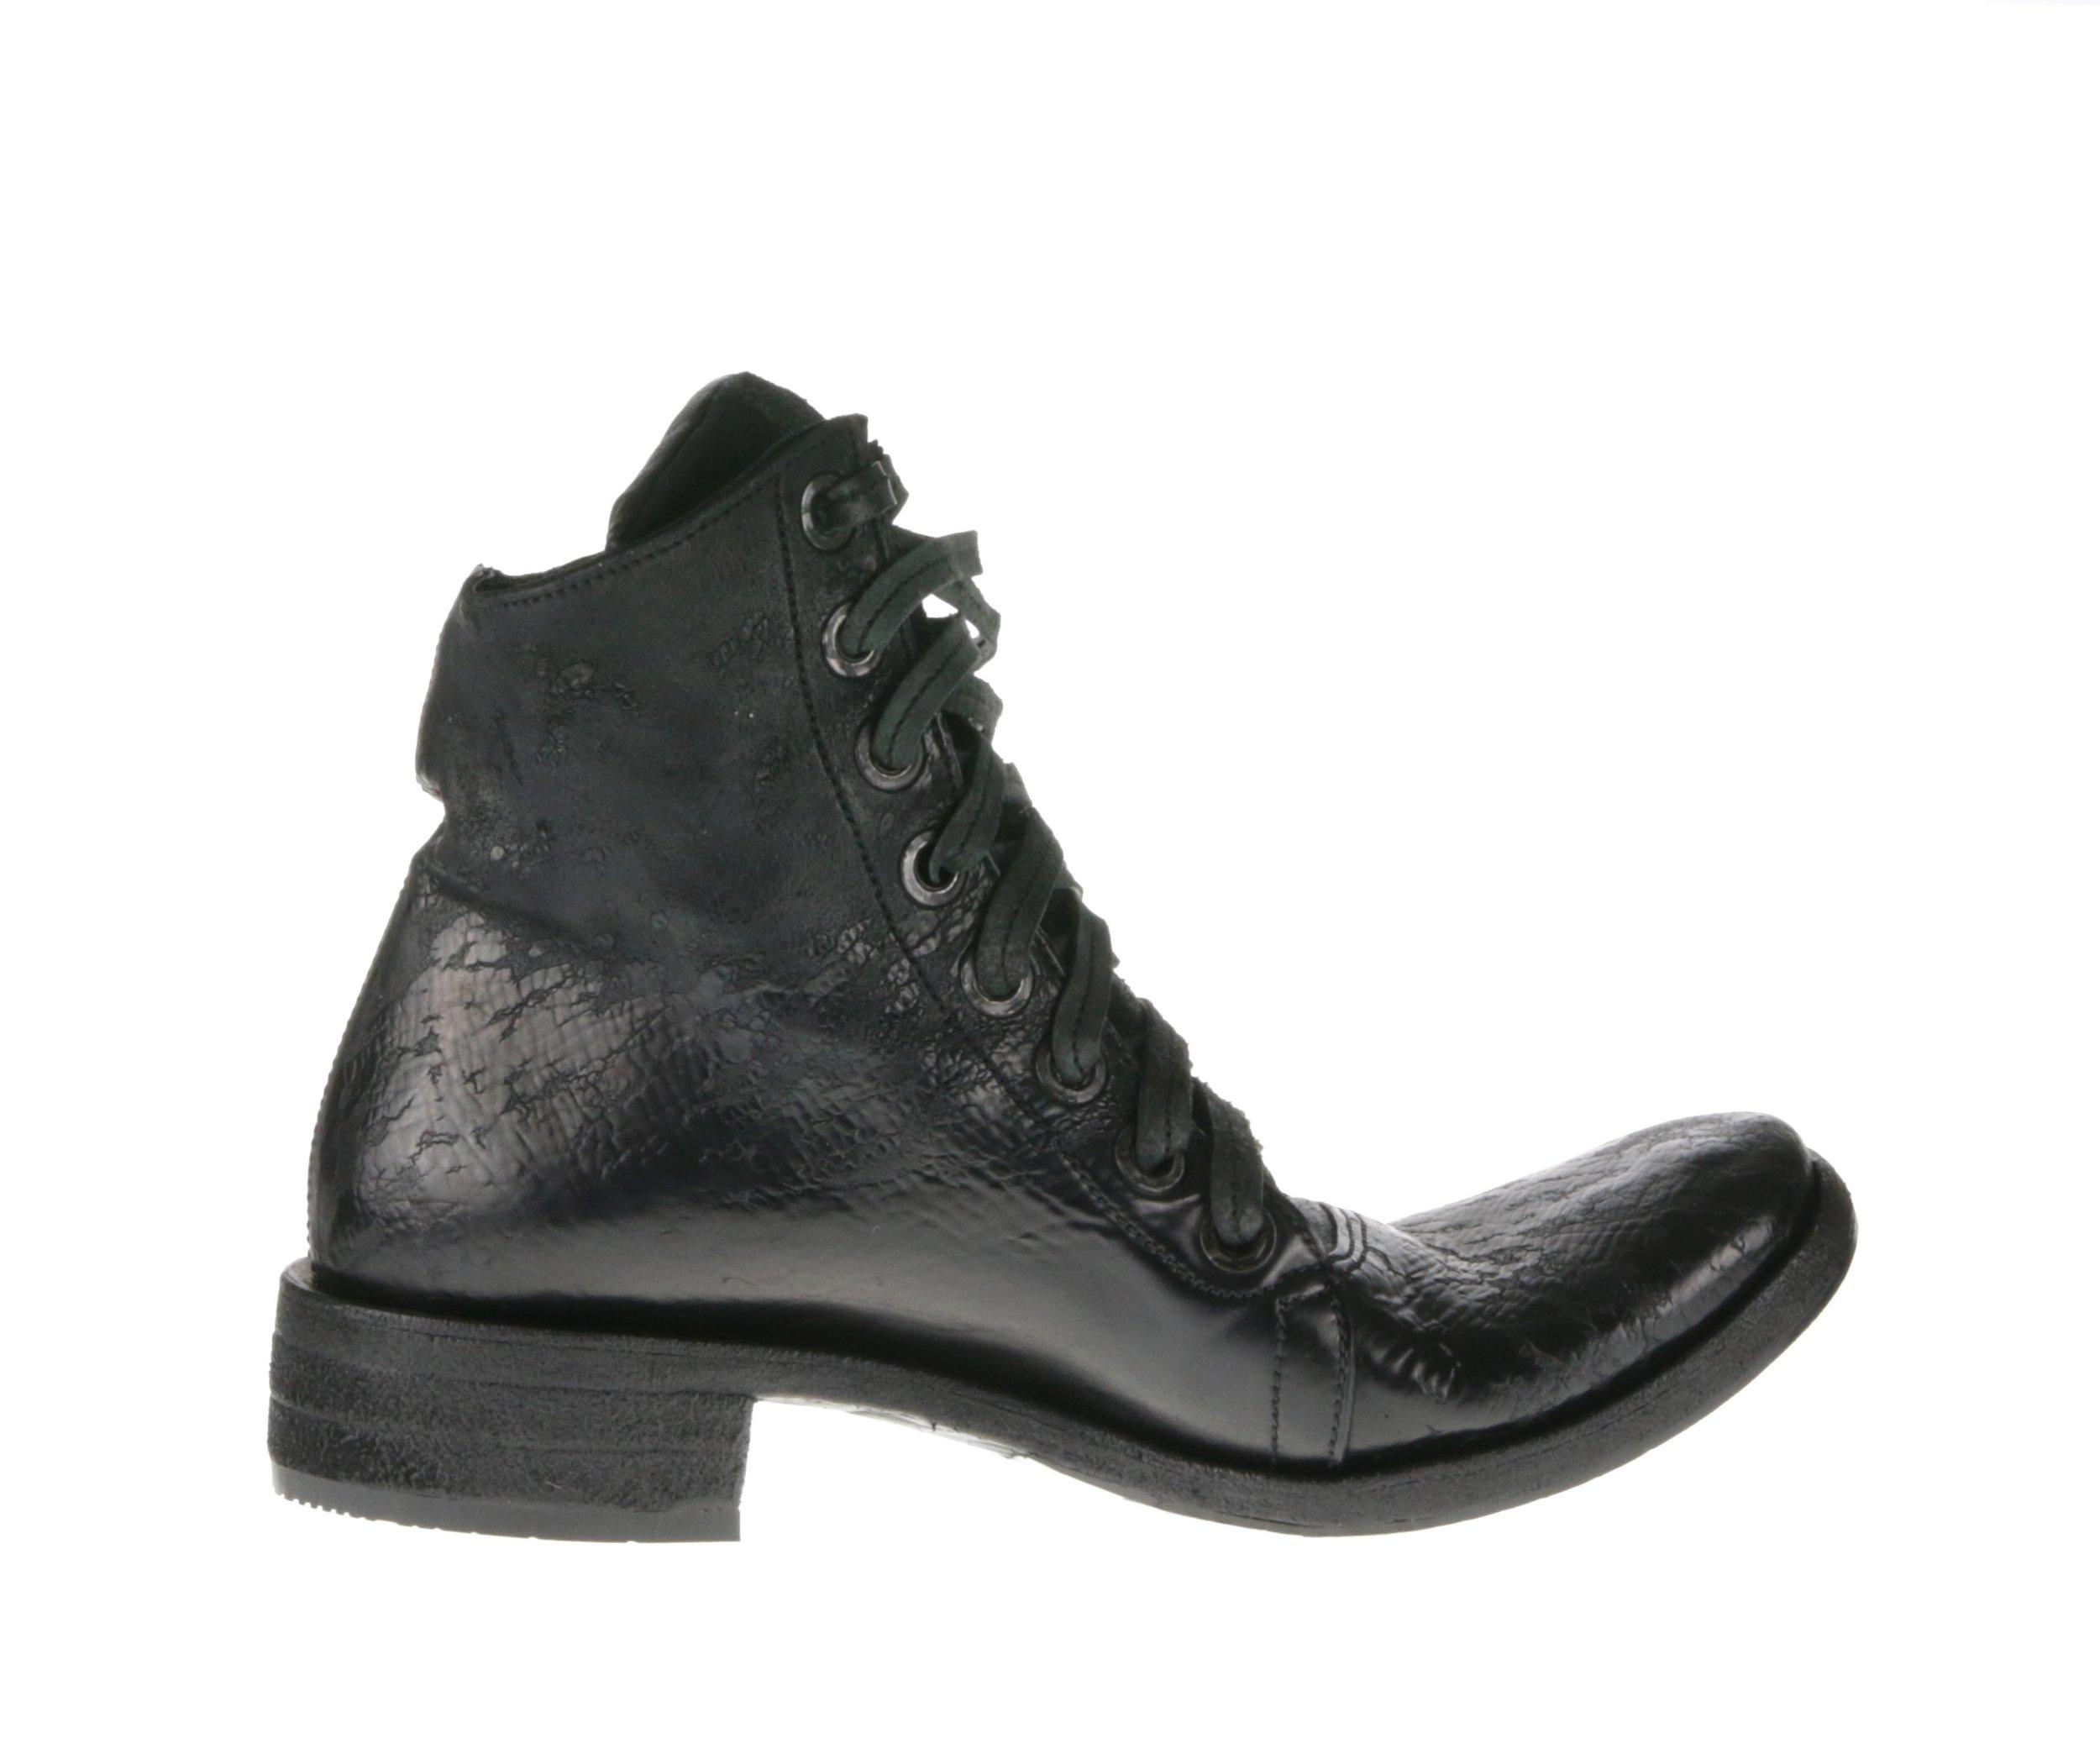 8Hole Boots Black Culatta Inside.jpg